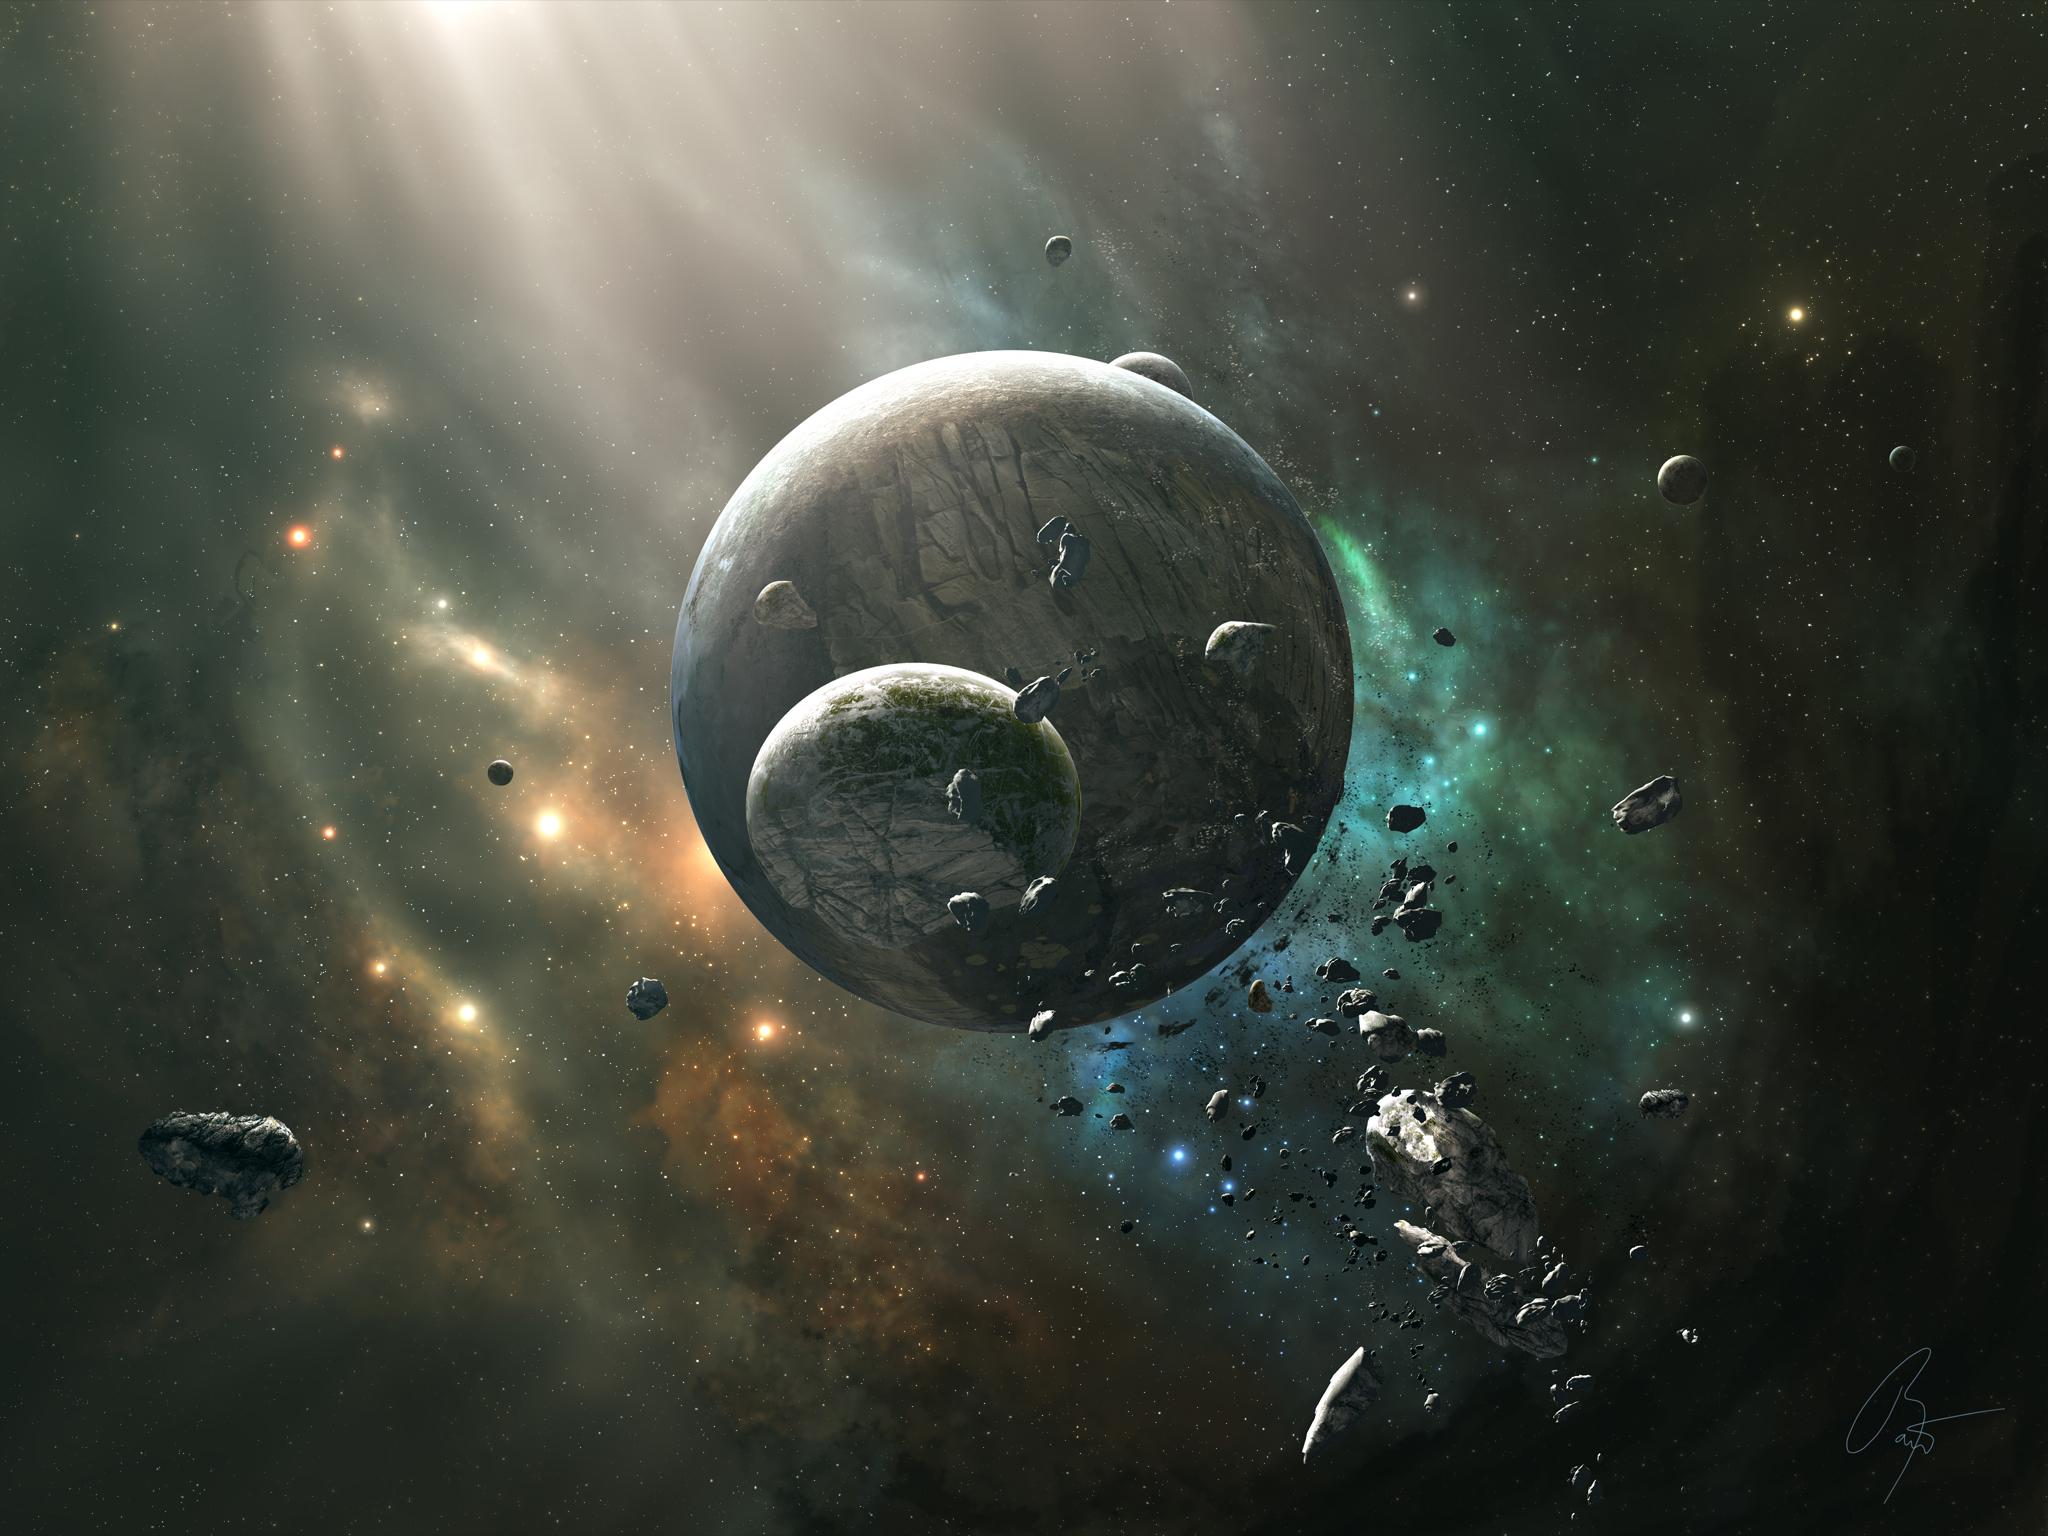 Digital Art Planet Space Artwork Nebula Atmosphere Universe JoeyJazz Astronomy Screenshot Outer Astronomical